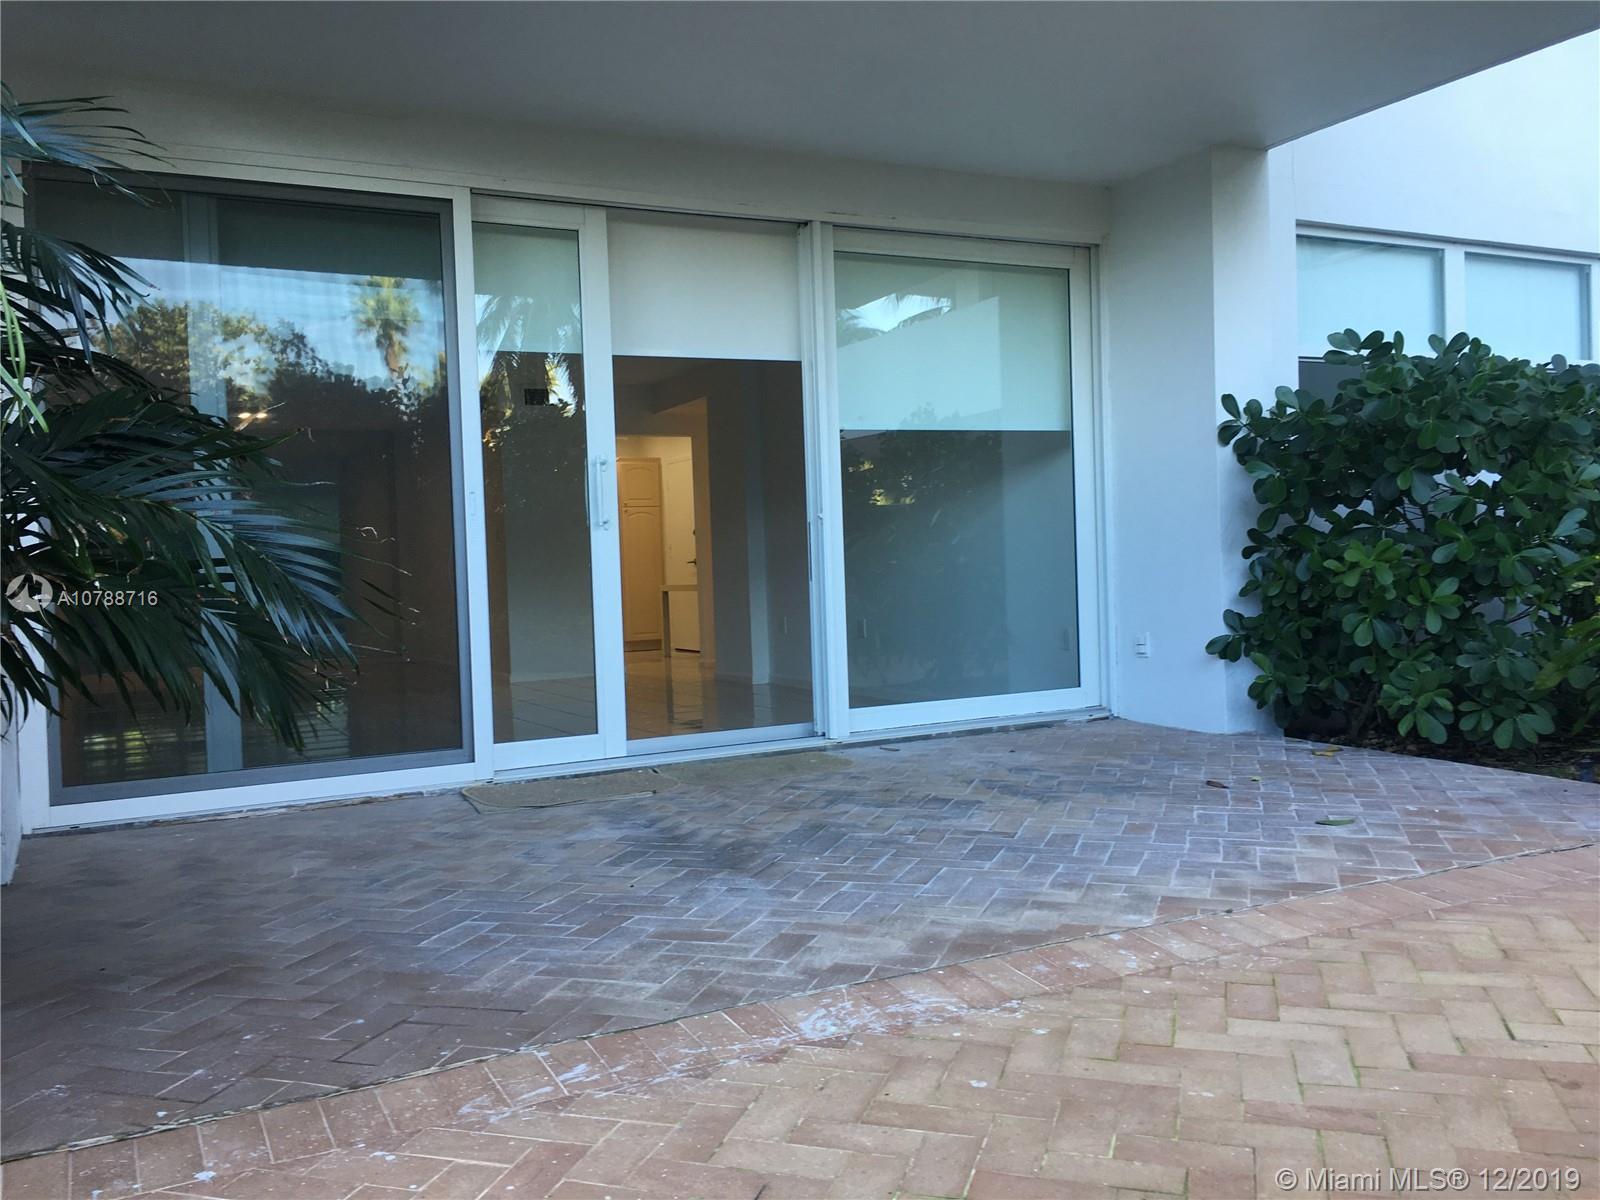 177  Ocean Lane Dr #106 For Sale A10788716, FL